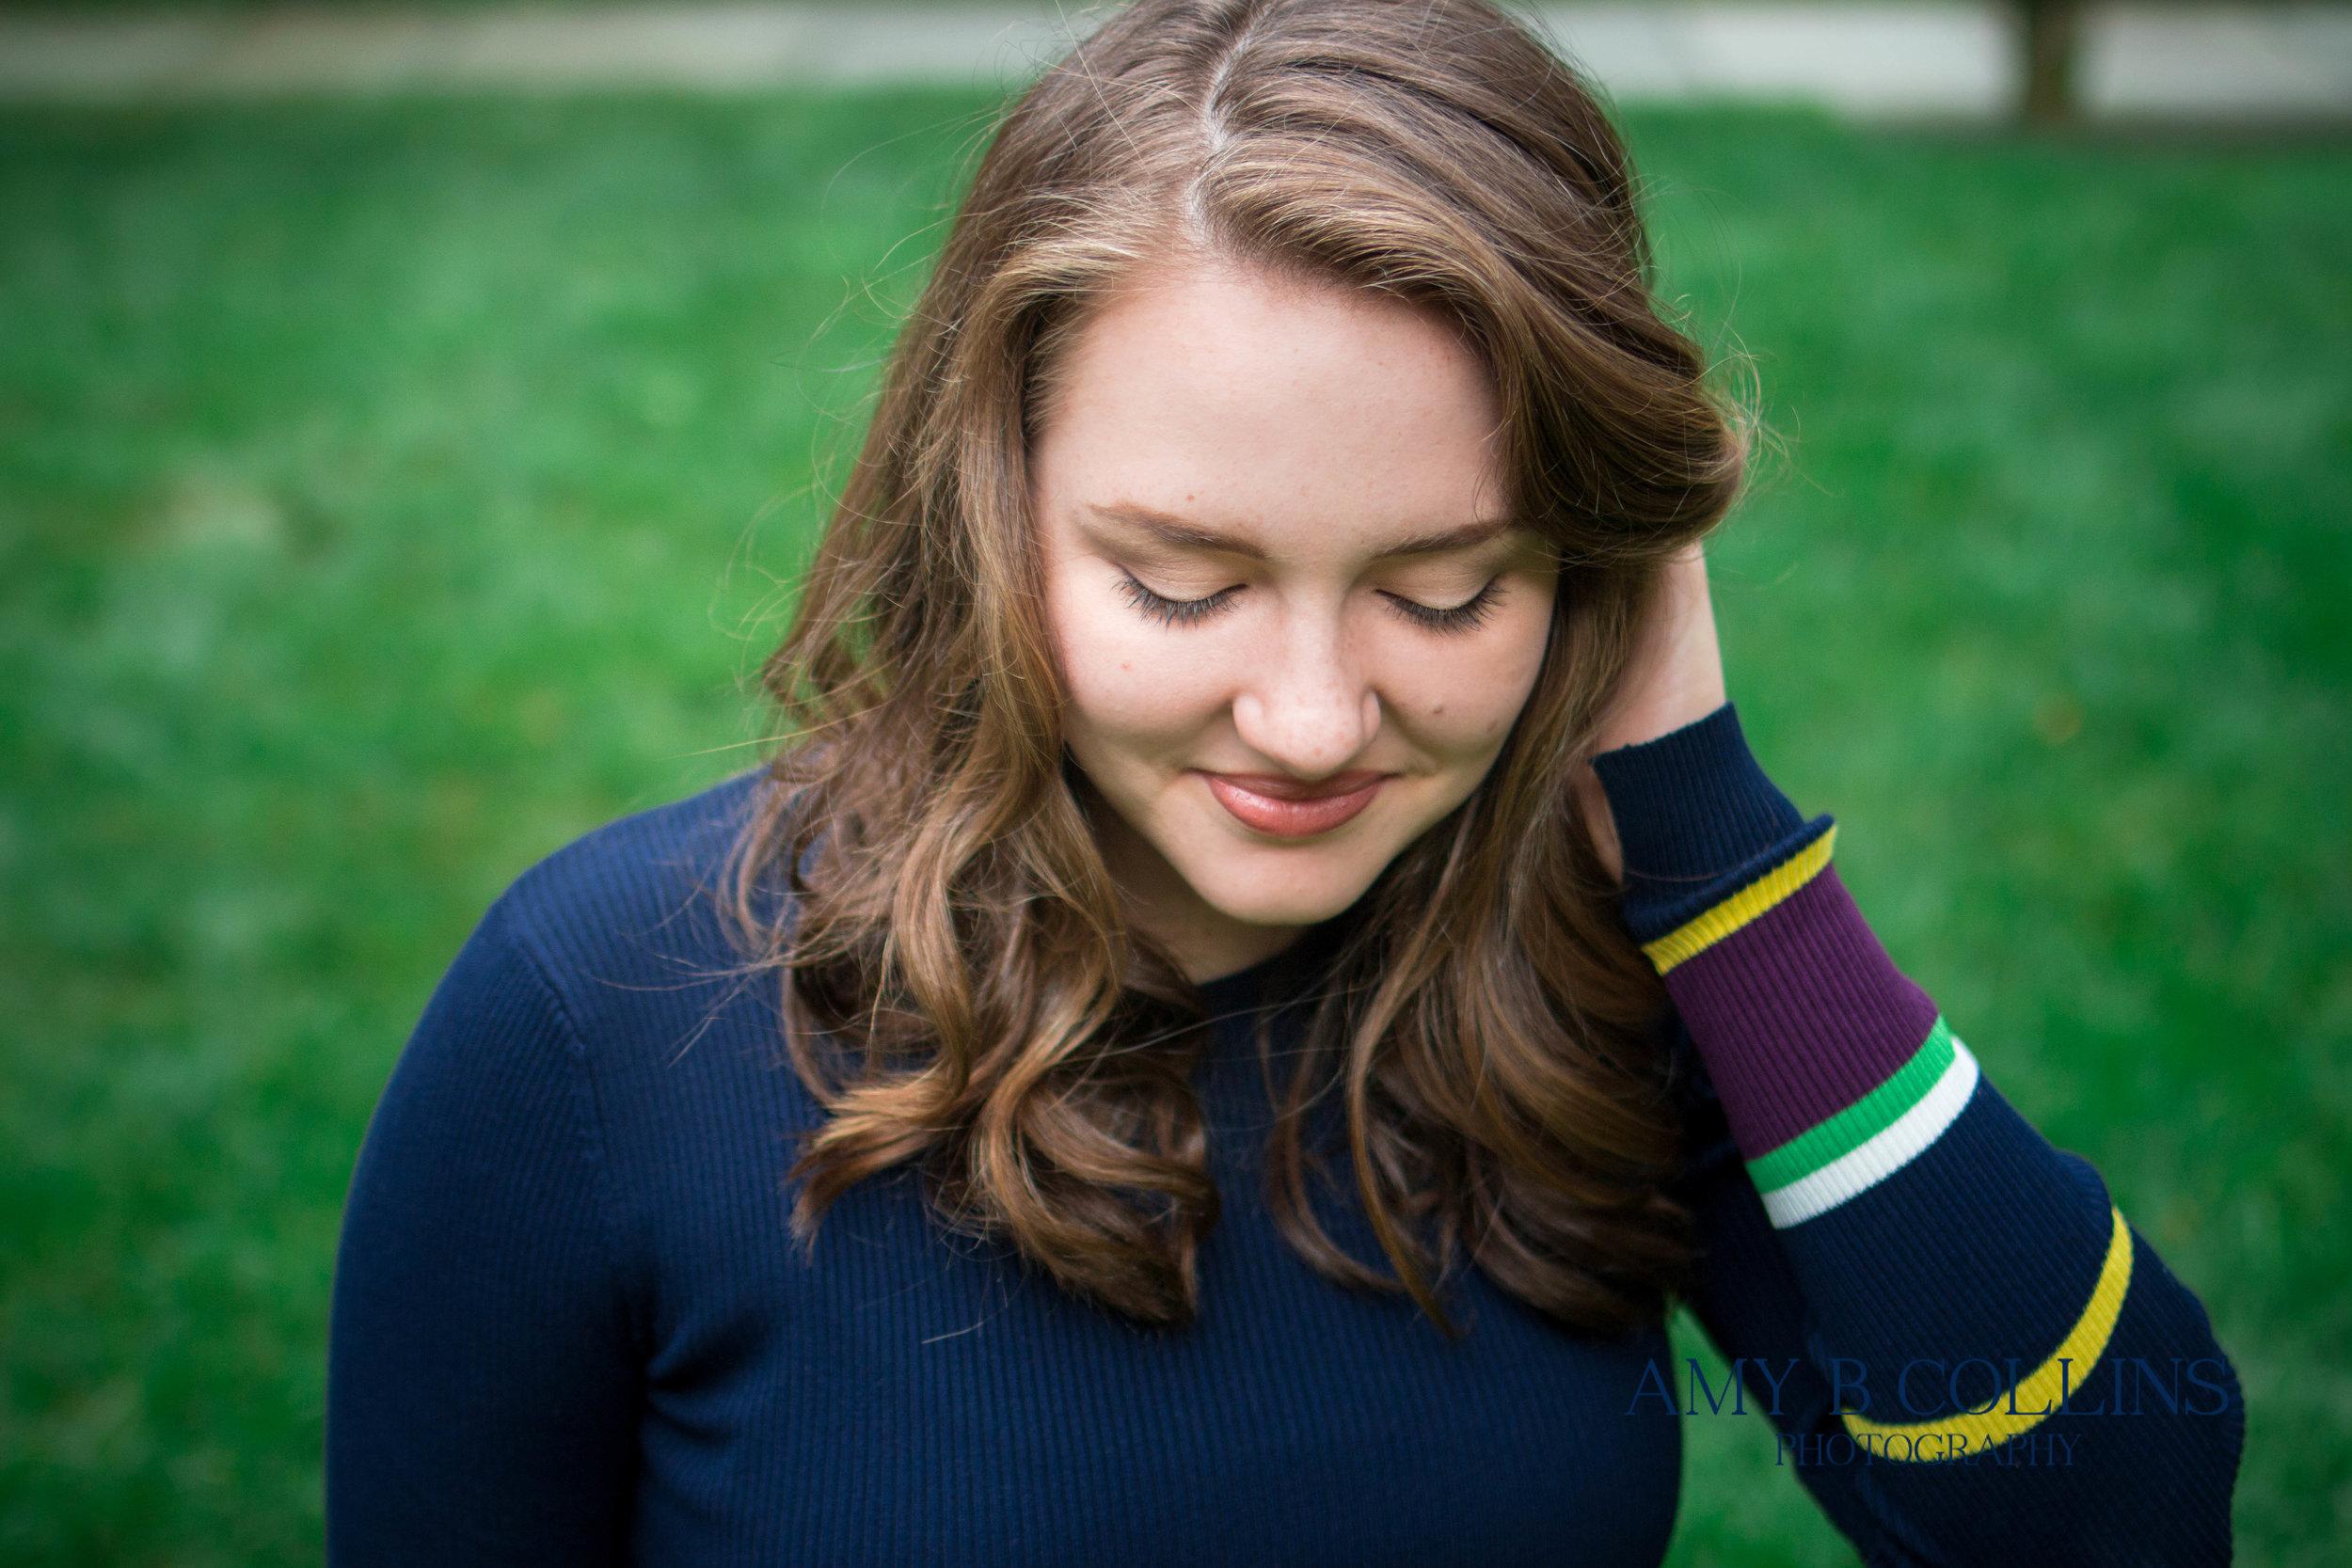 AmyBCollinsPhotography_SeniorSession_Sasha-5.jpg